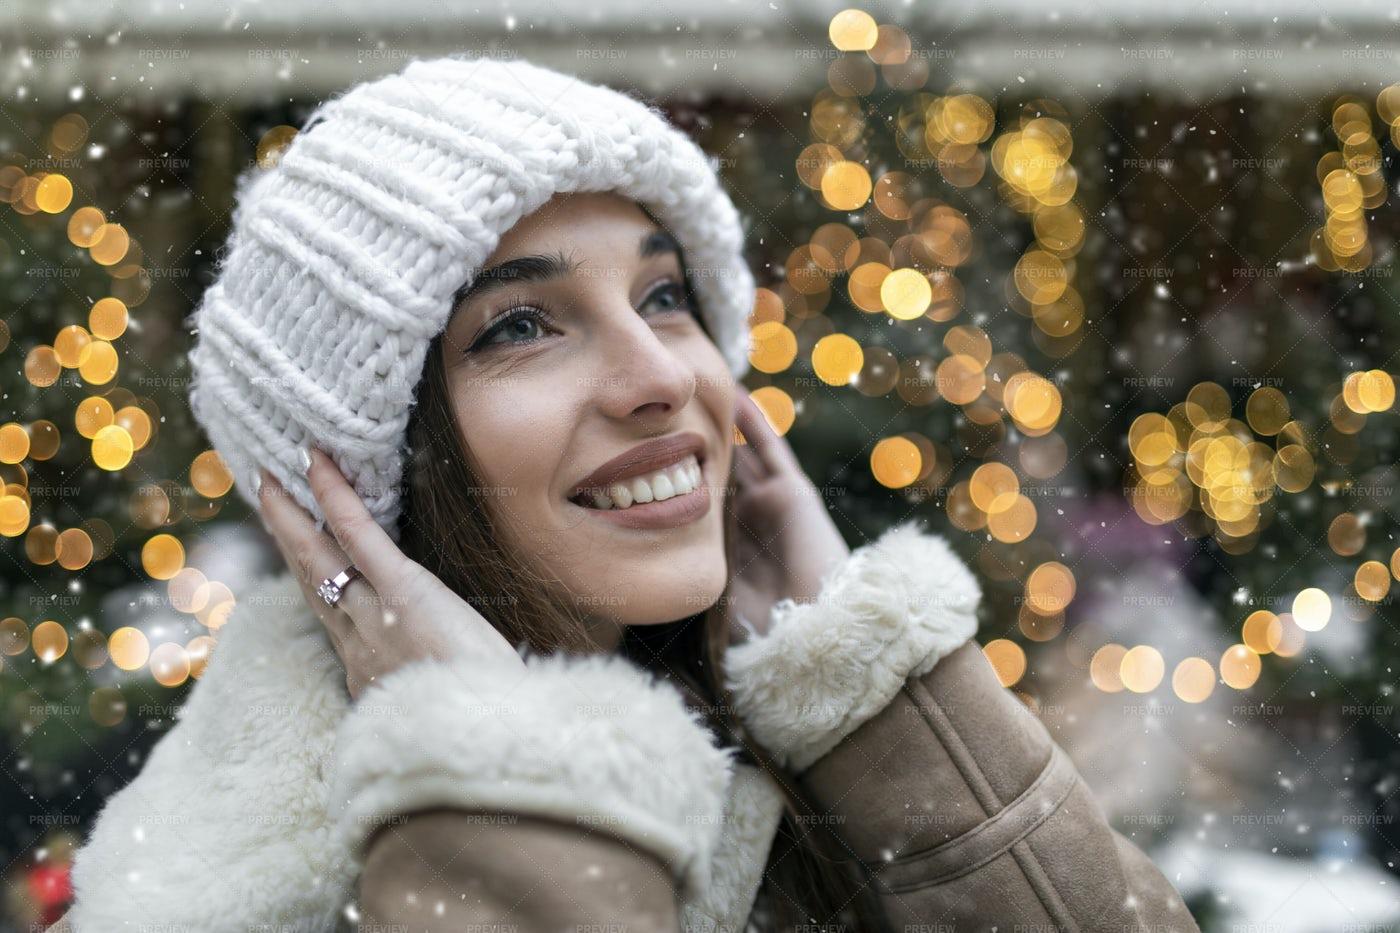 Snowy Christmas Girl: Stock Photos